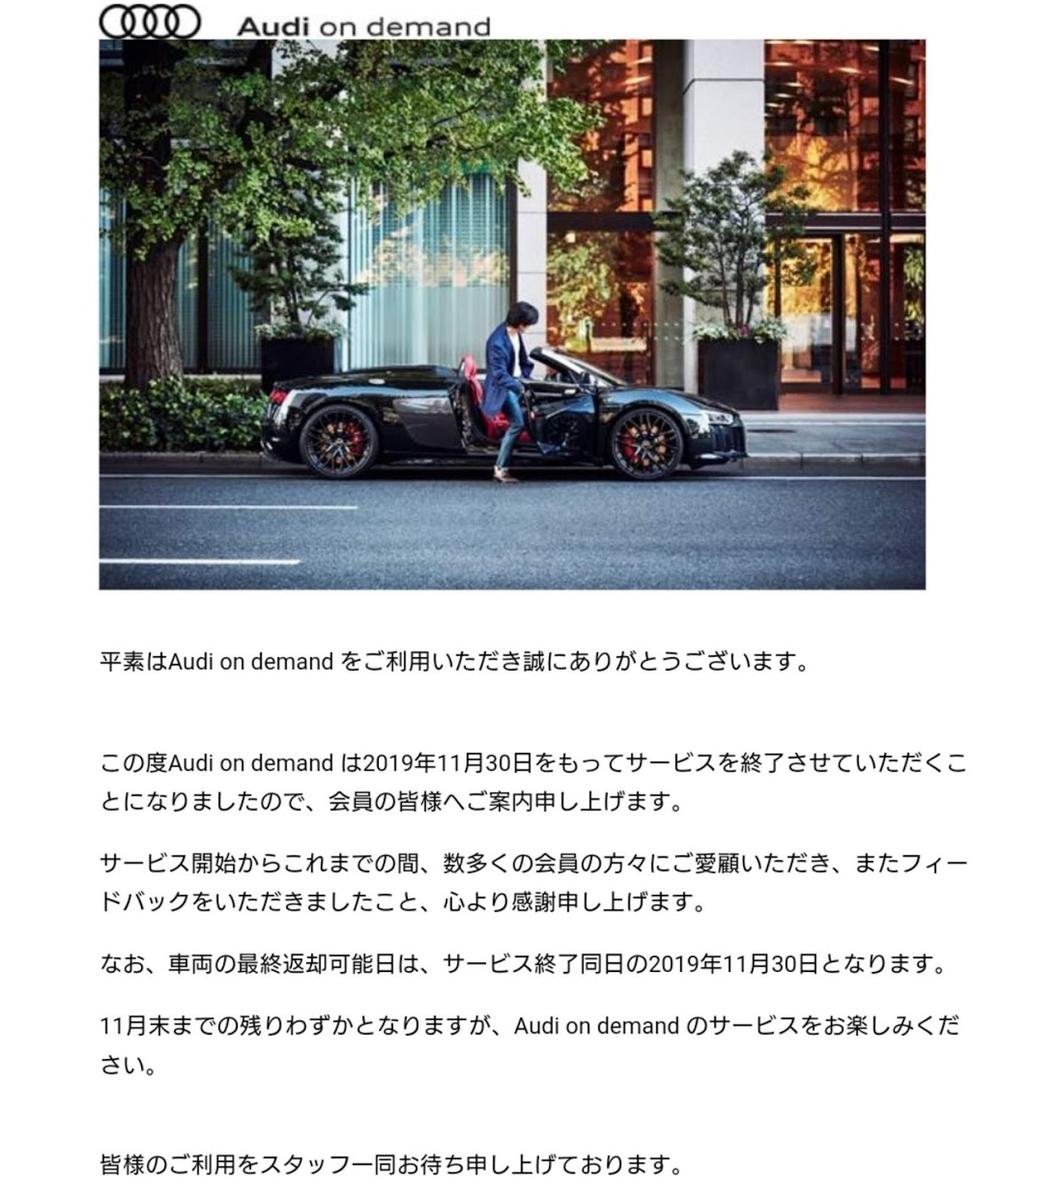 f:id:kurumazukinogen:20191216001836j:plain